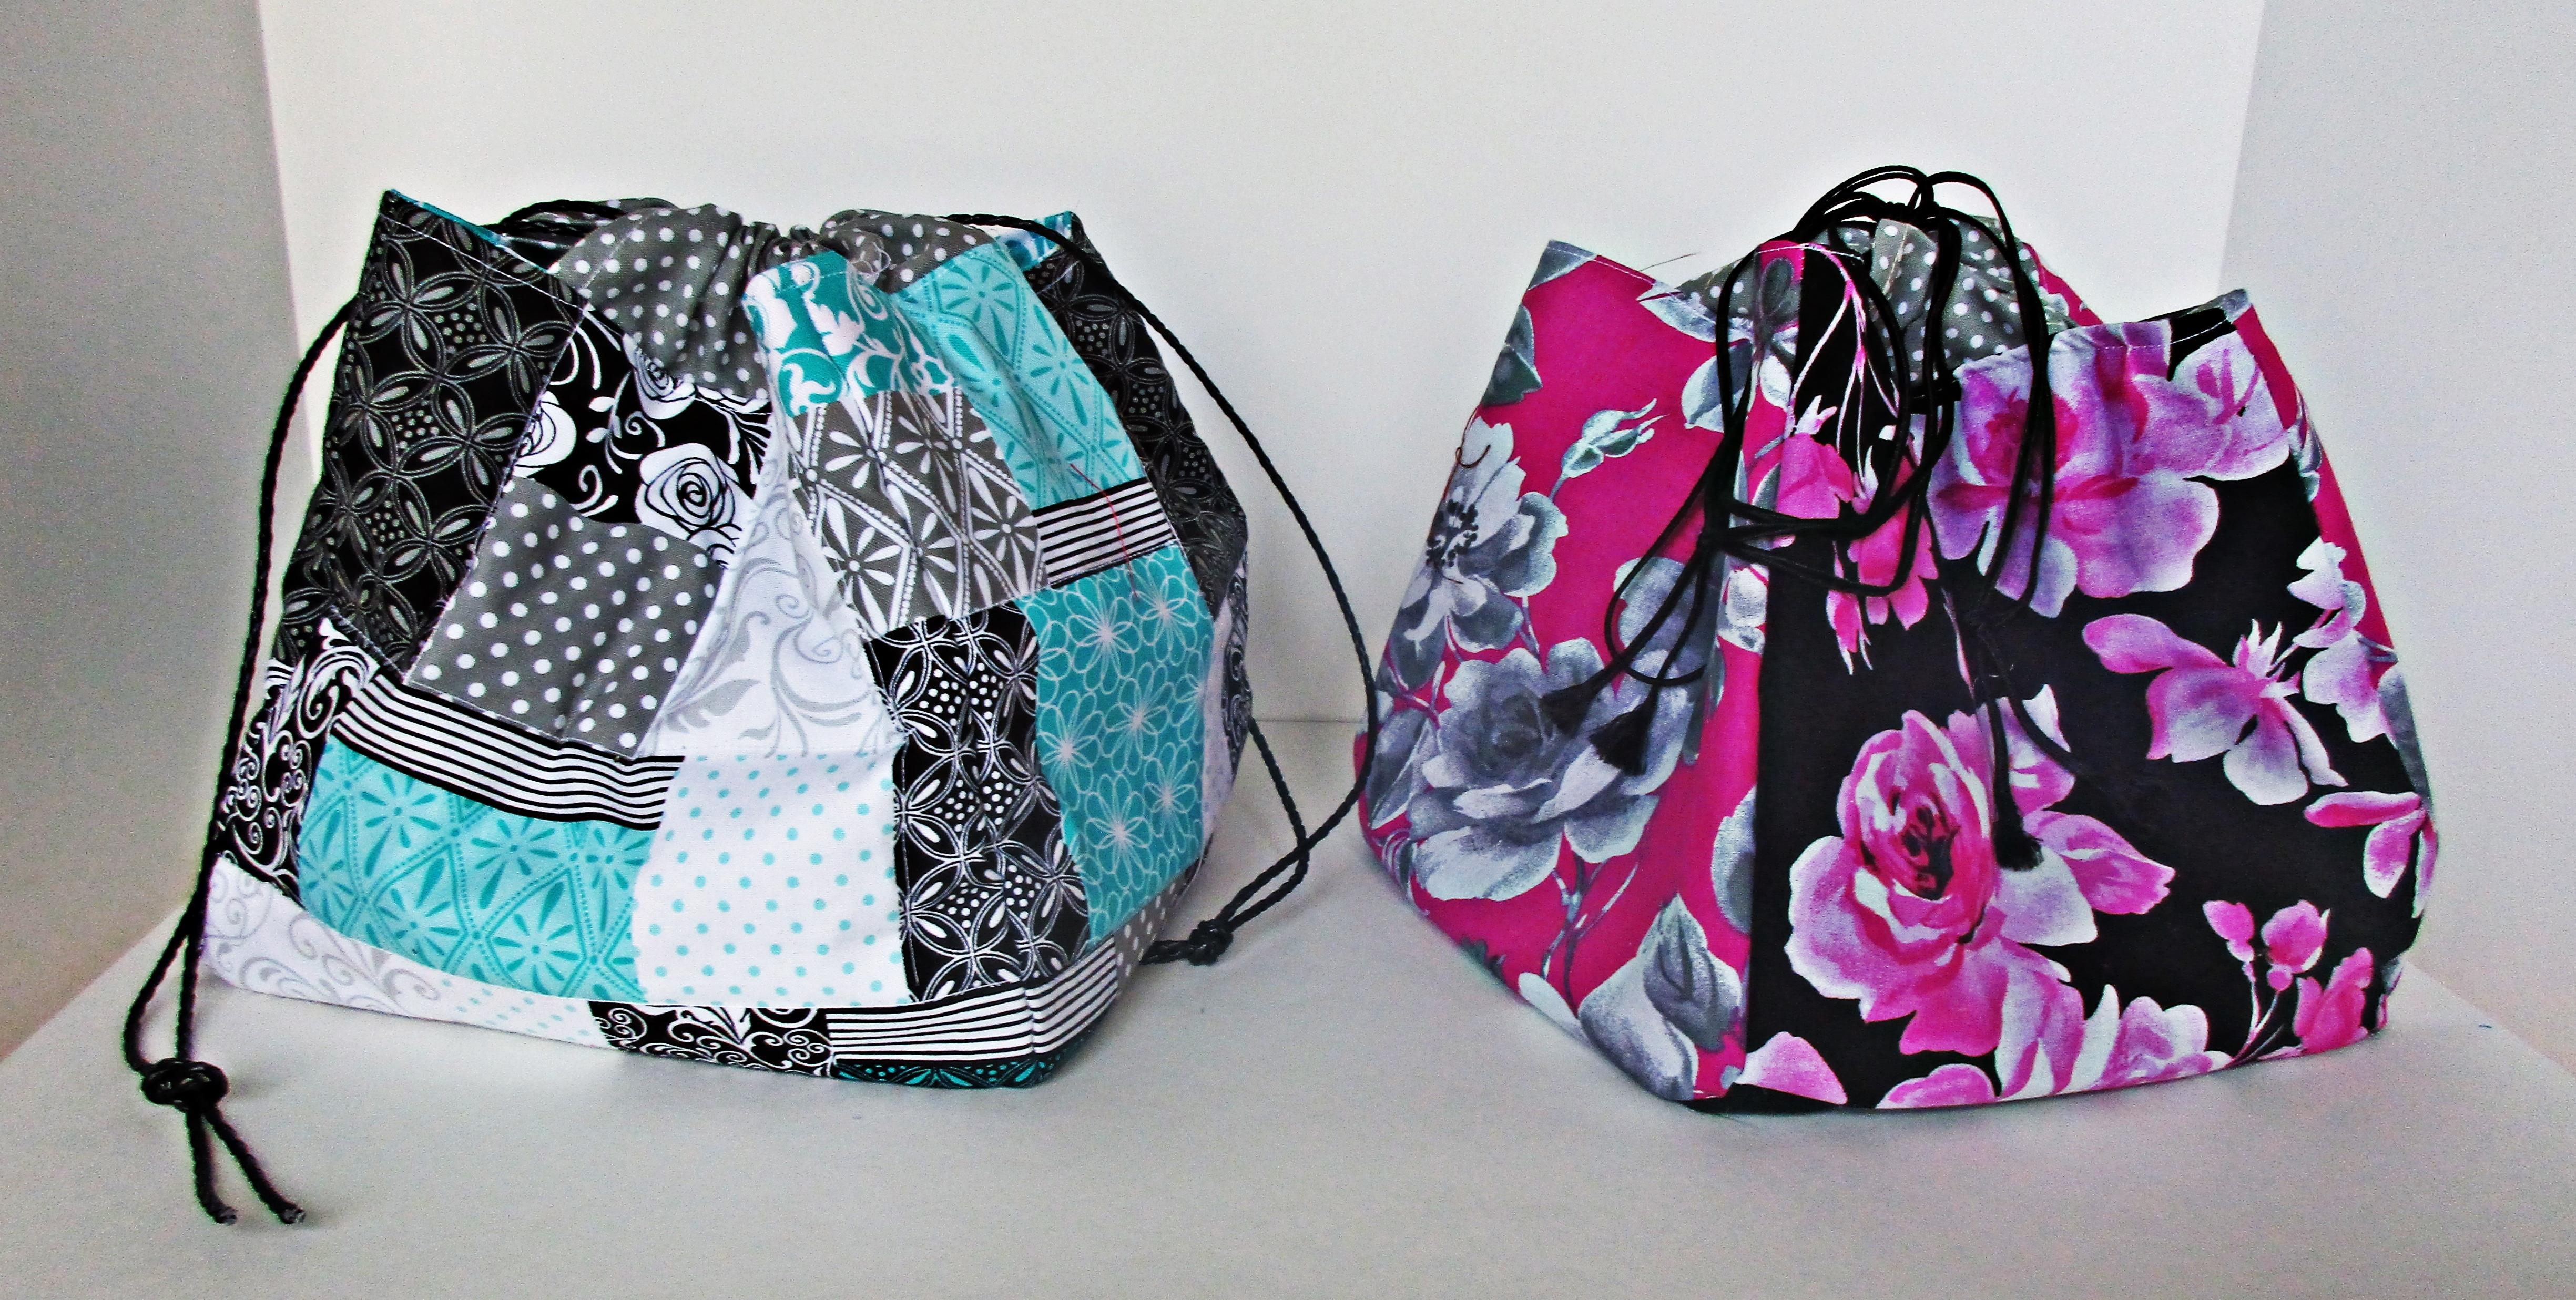 Dashwood Floral Fabric Medium Drawstring Bag Project Bag Project Bag